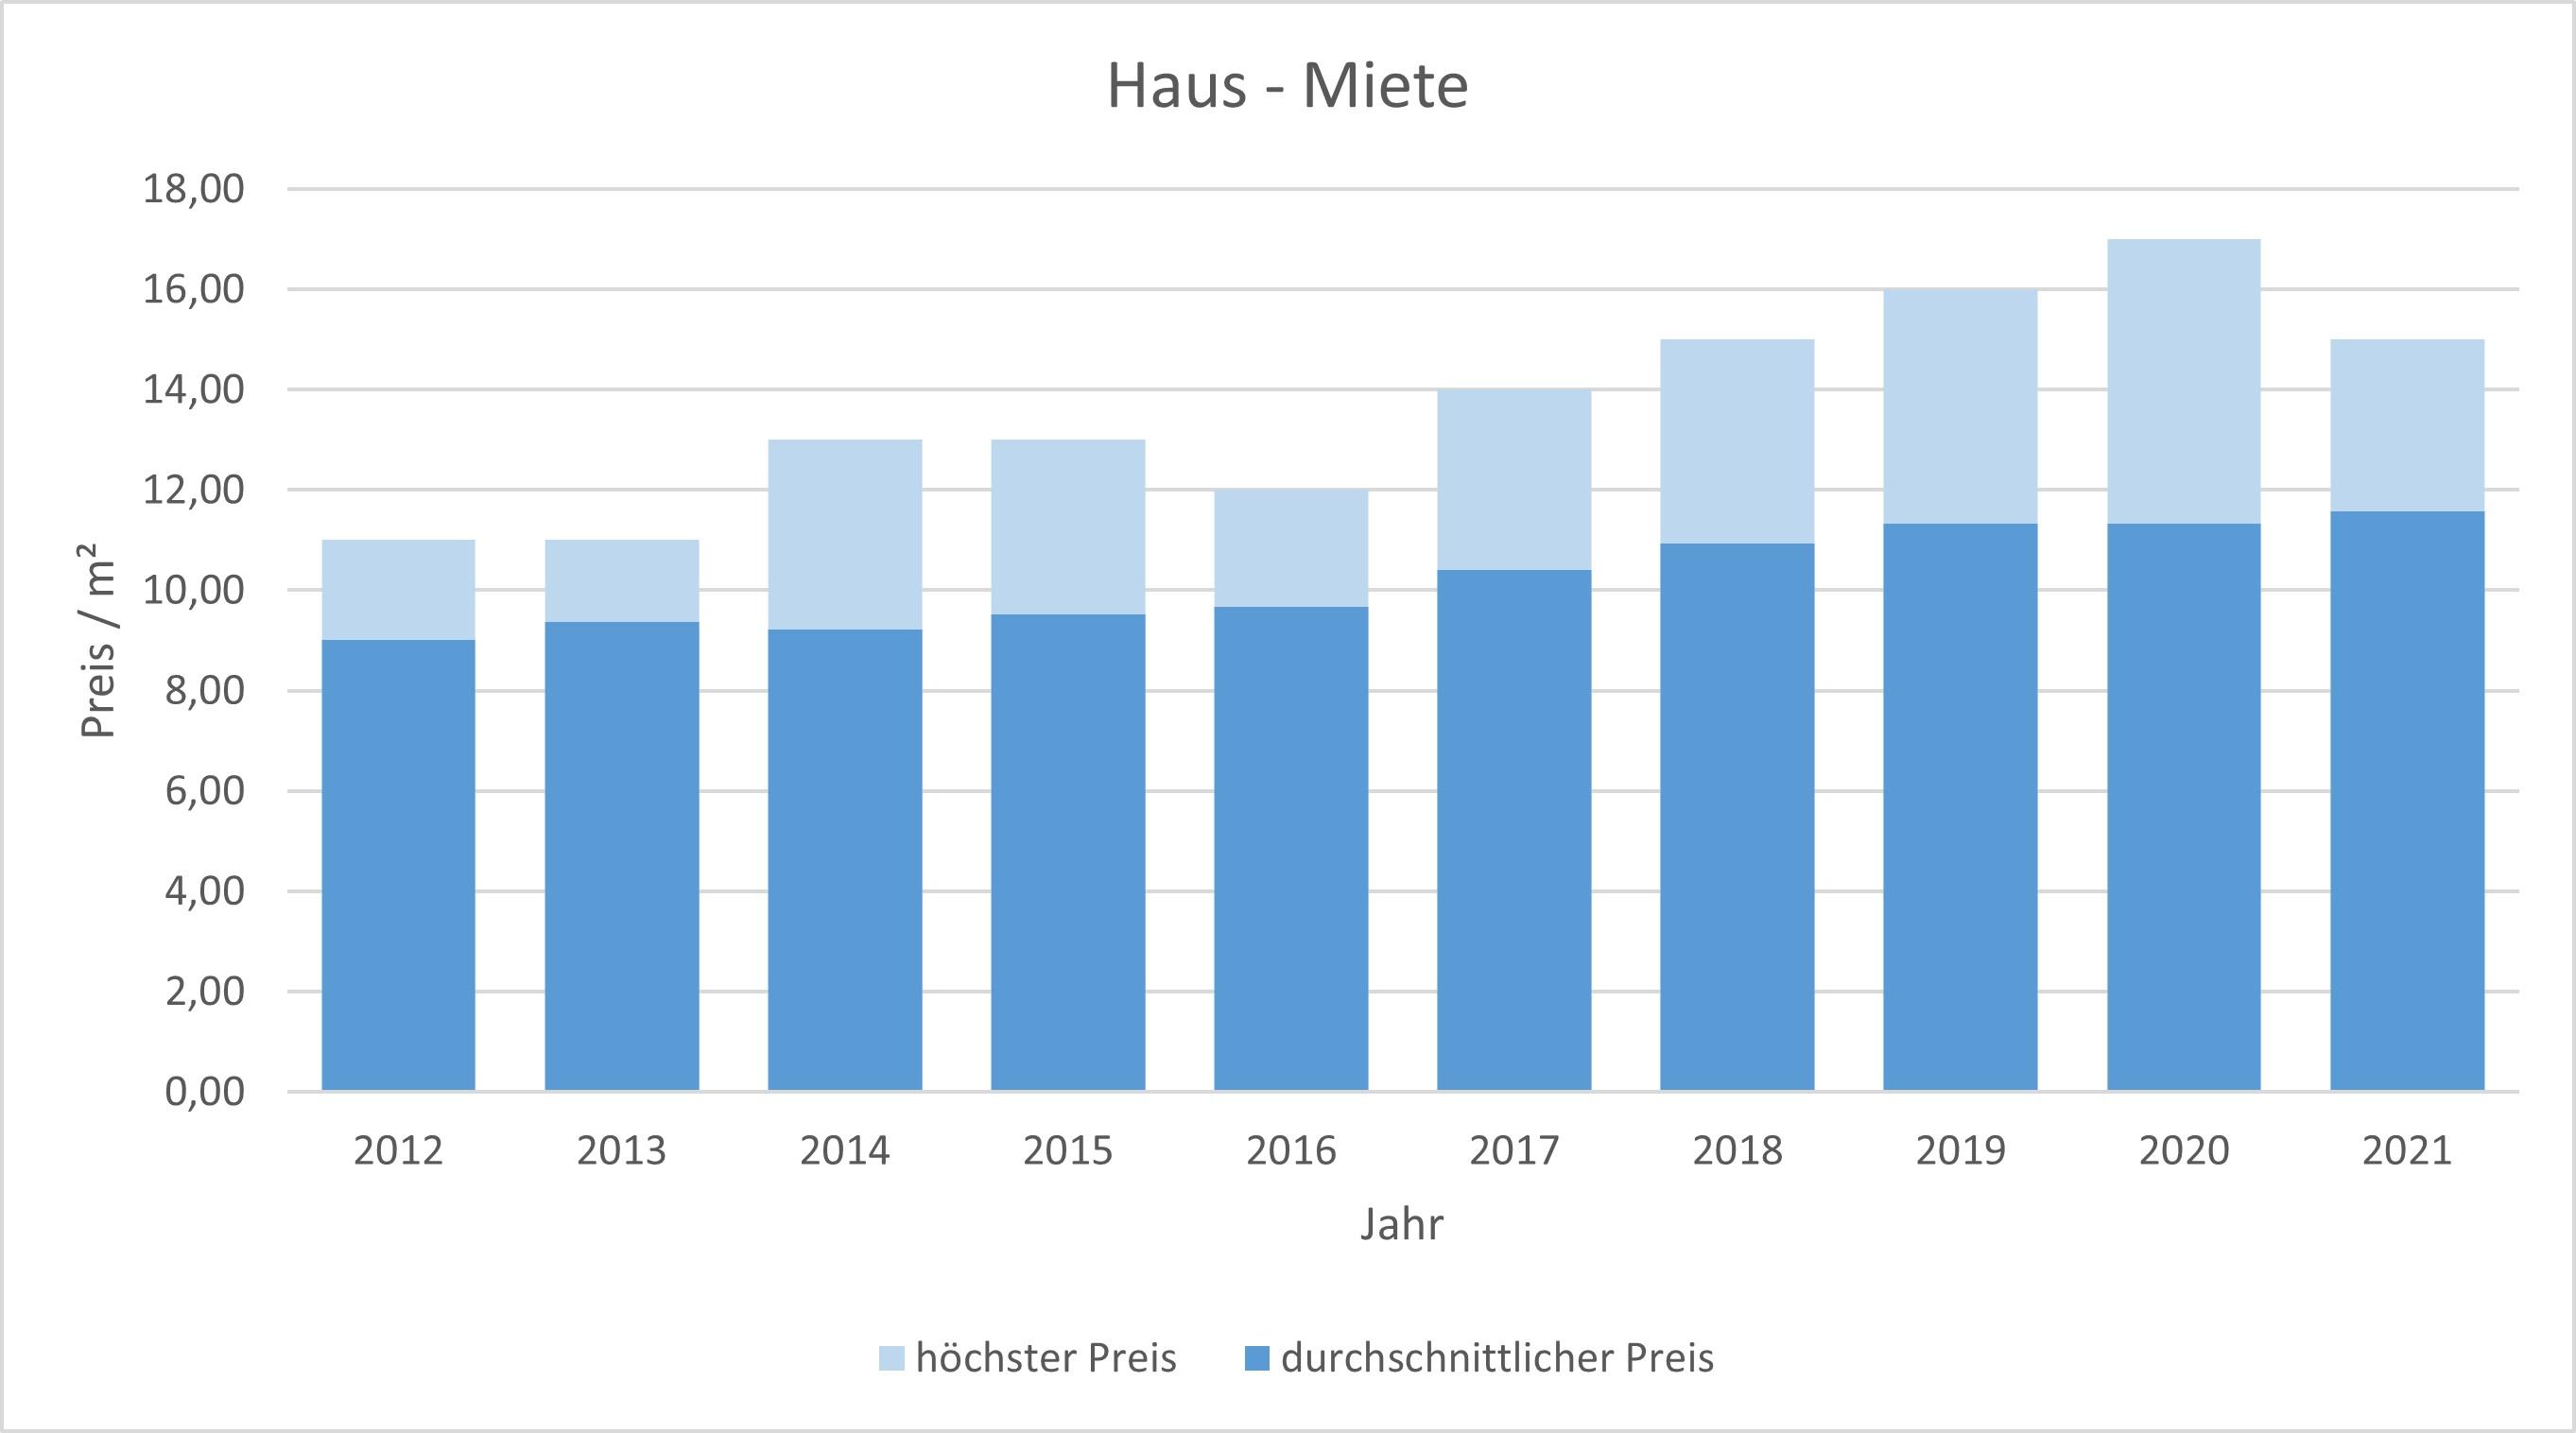 Bad Aibling Makler Haus vermieten mieten Preis Bewertung 2019, 2020, 2021